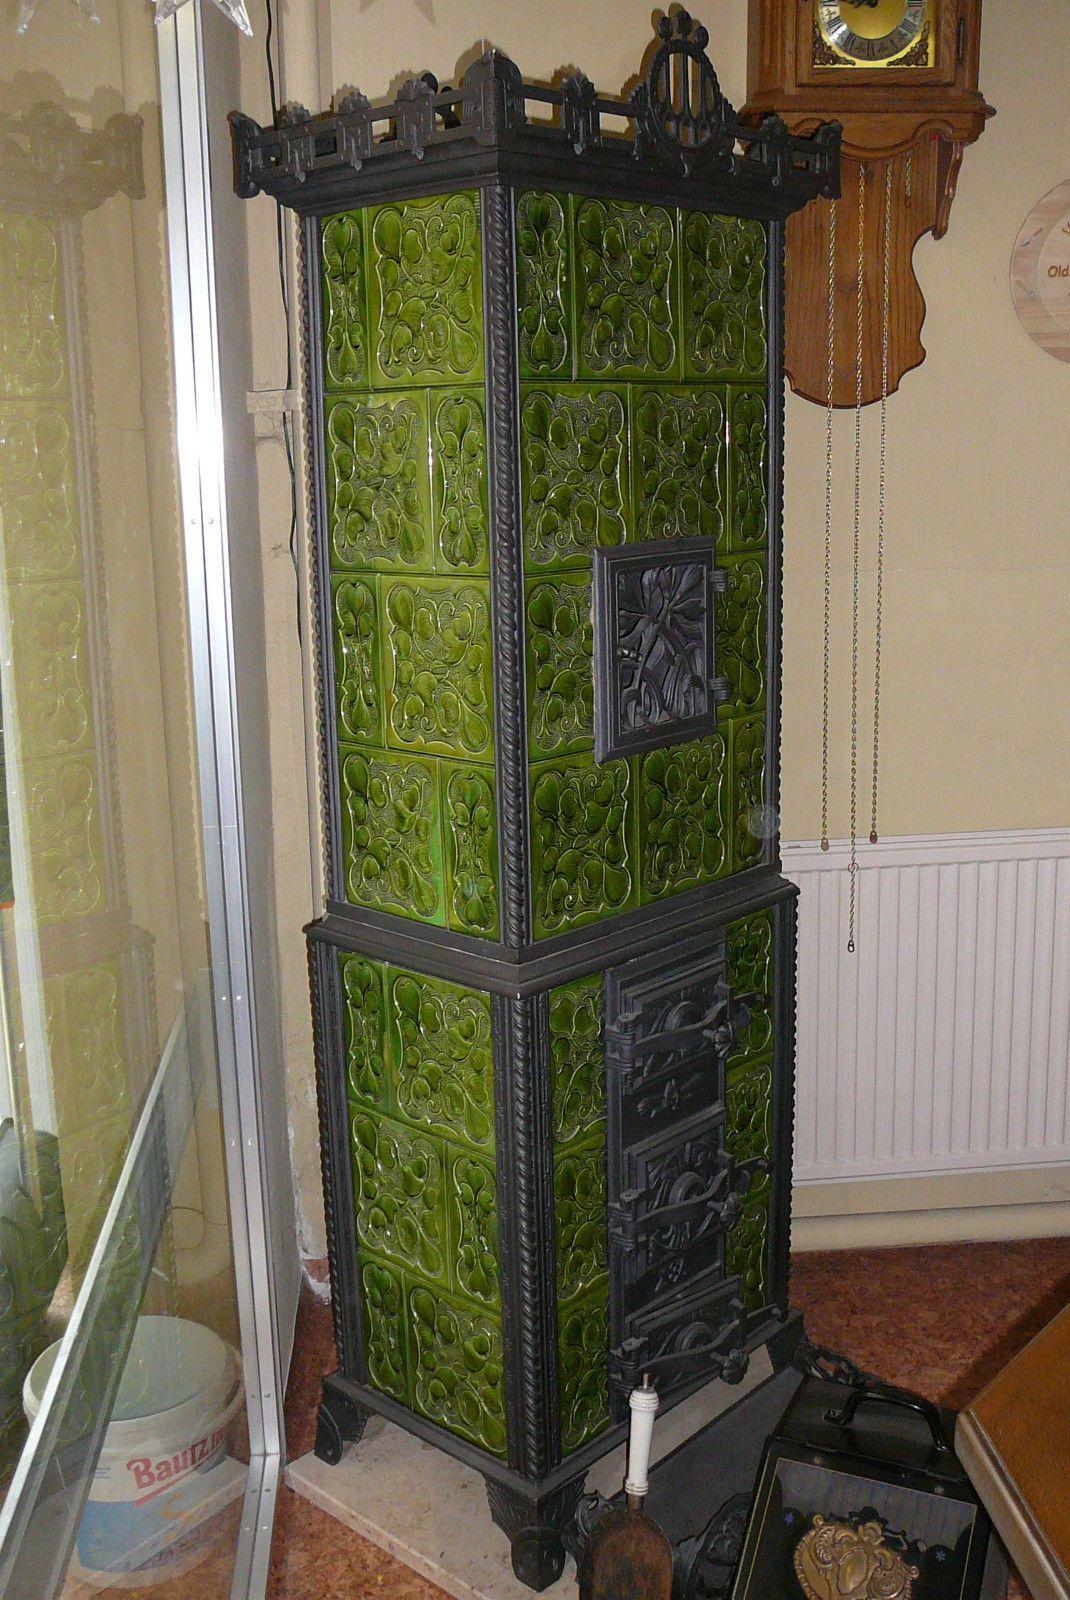 kachelofen antik meissner kacheln sehr guter zustand funktionsf hig restauriert ebay fen. Black Bedroom Furniture Sets. Home Design Ideas